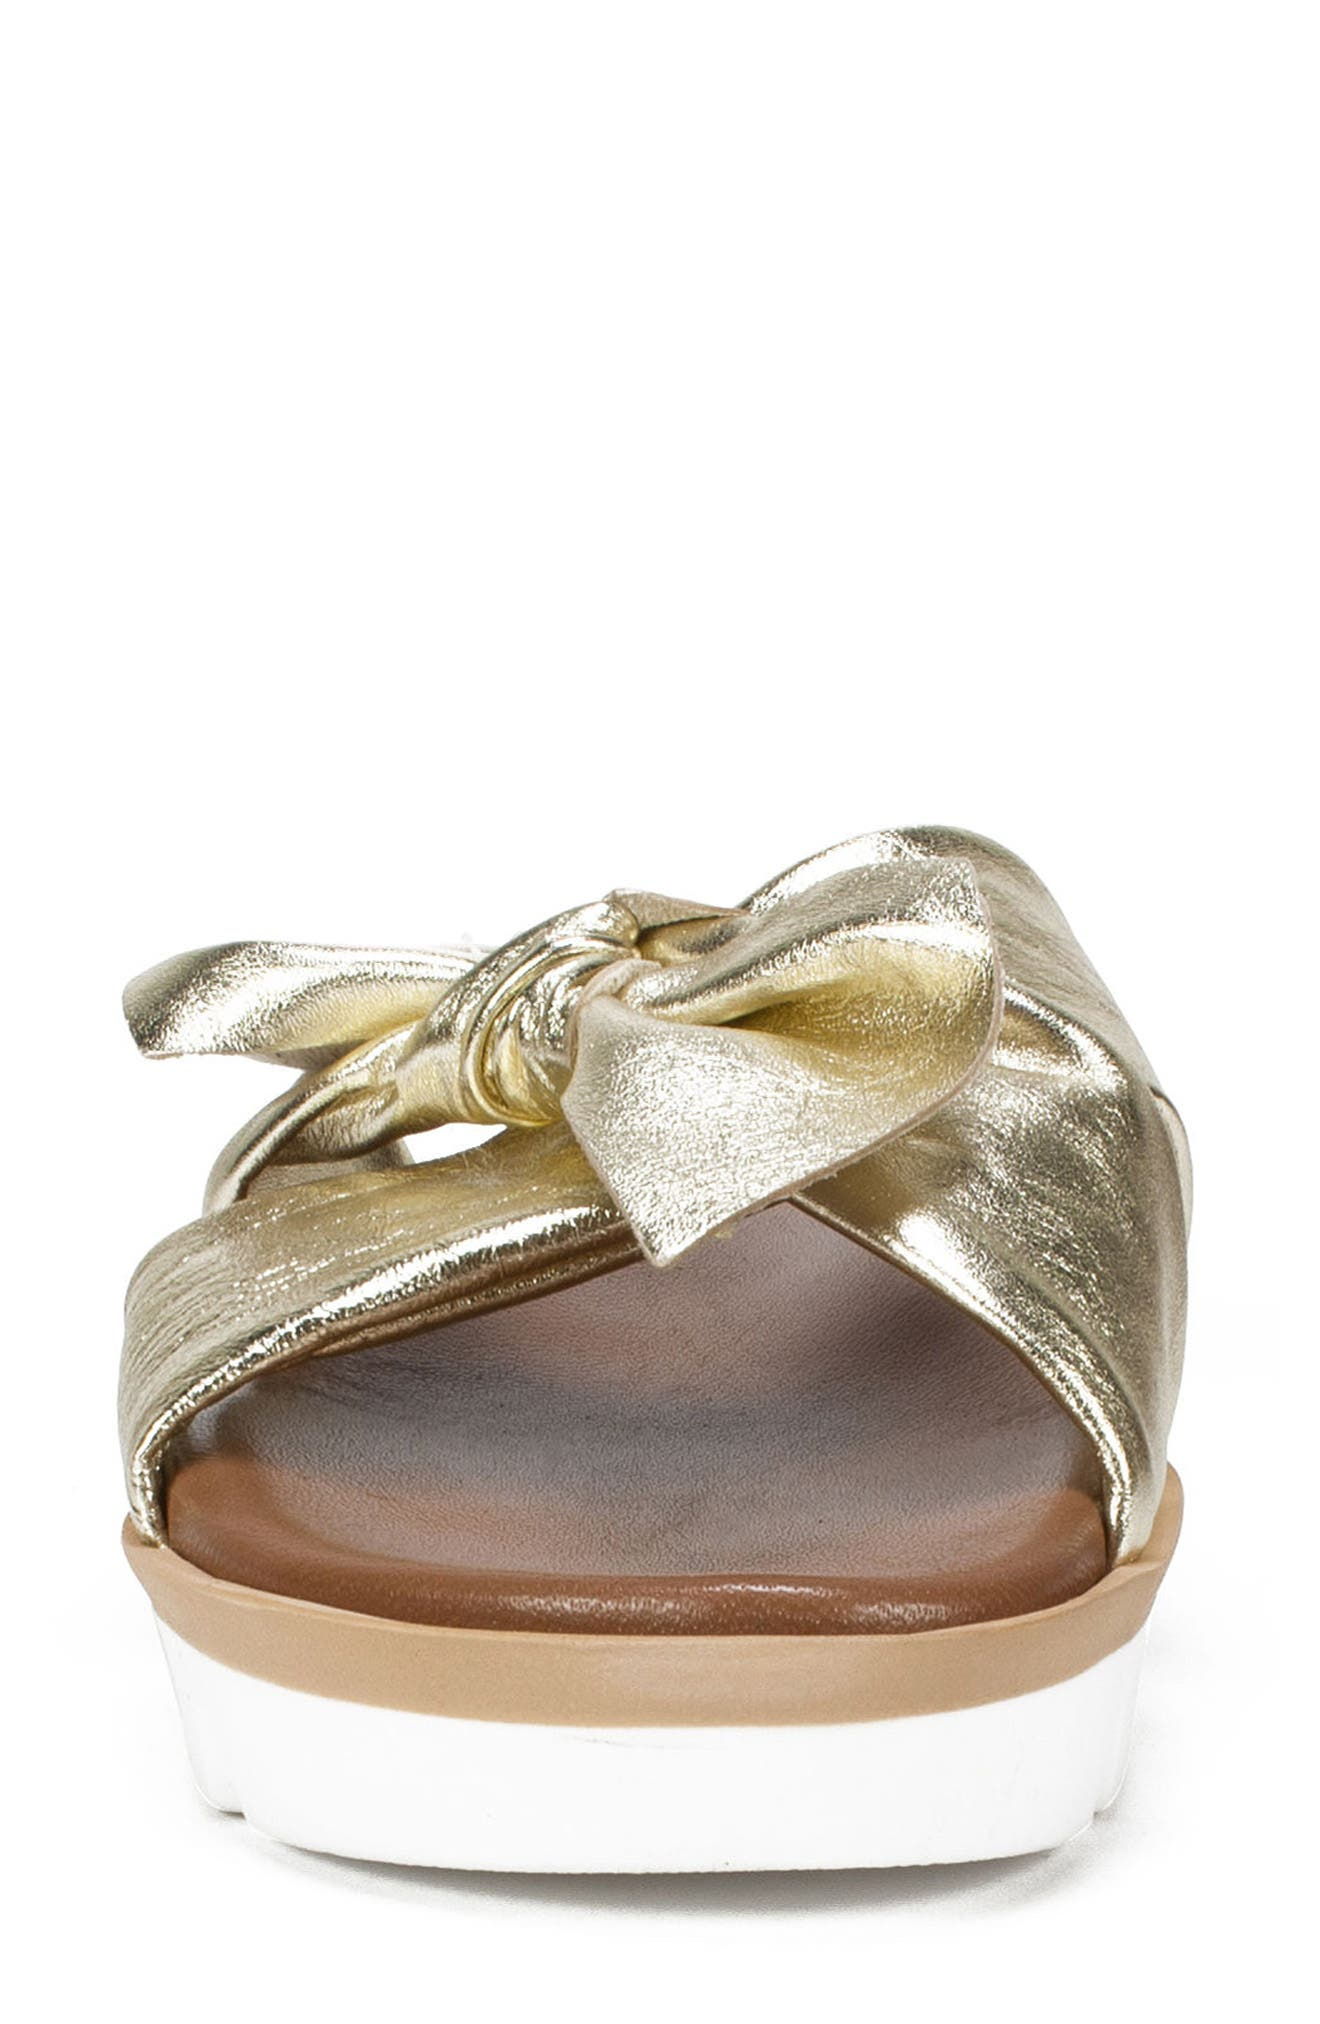 Fynn Slide Sandal,                             Alternate thumbnail 4, color,                             Platinum Leather